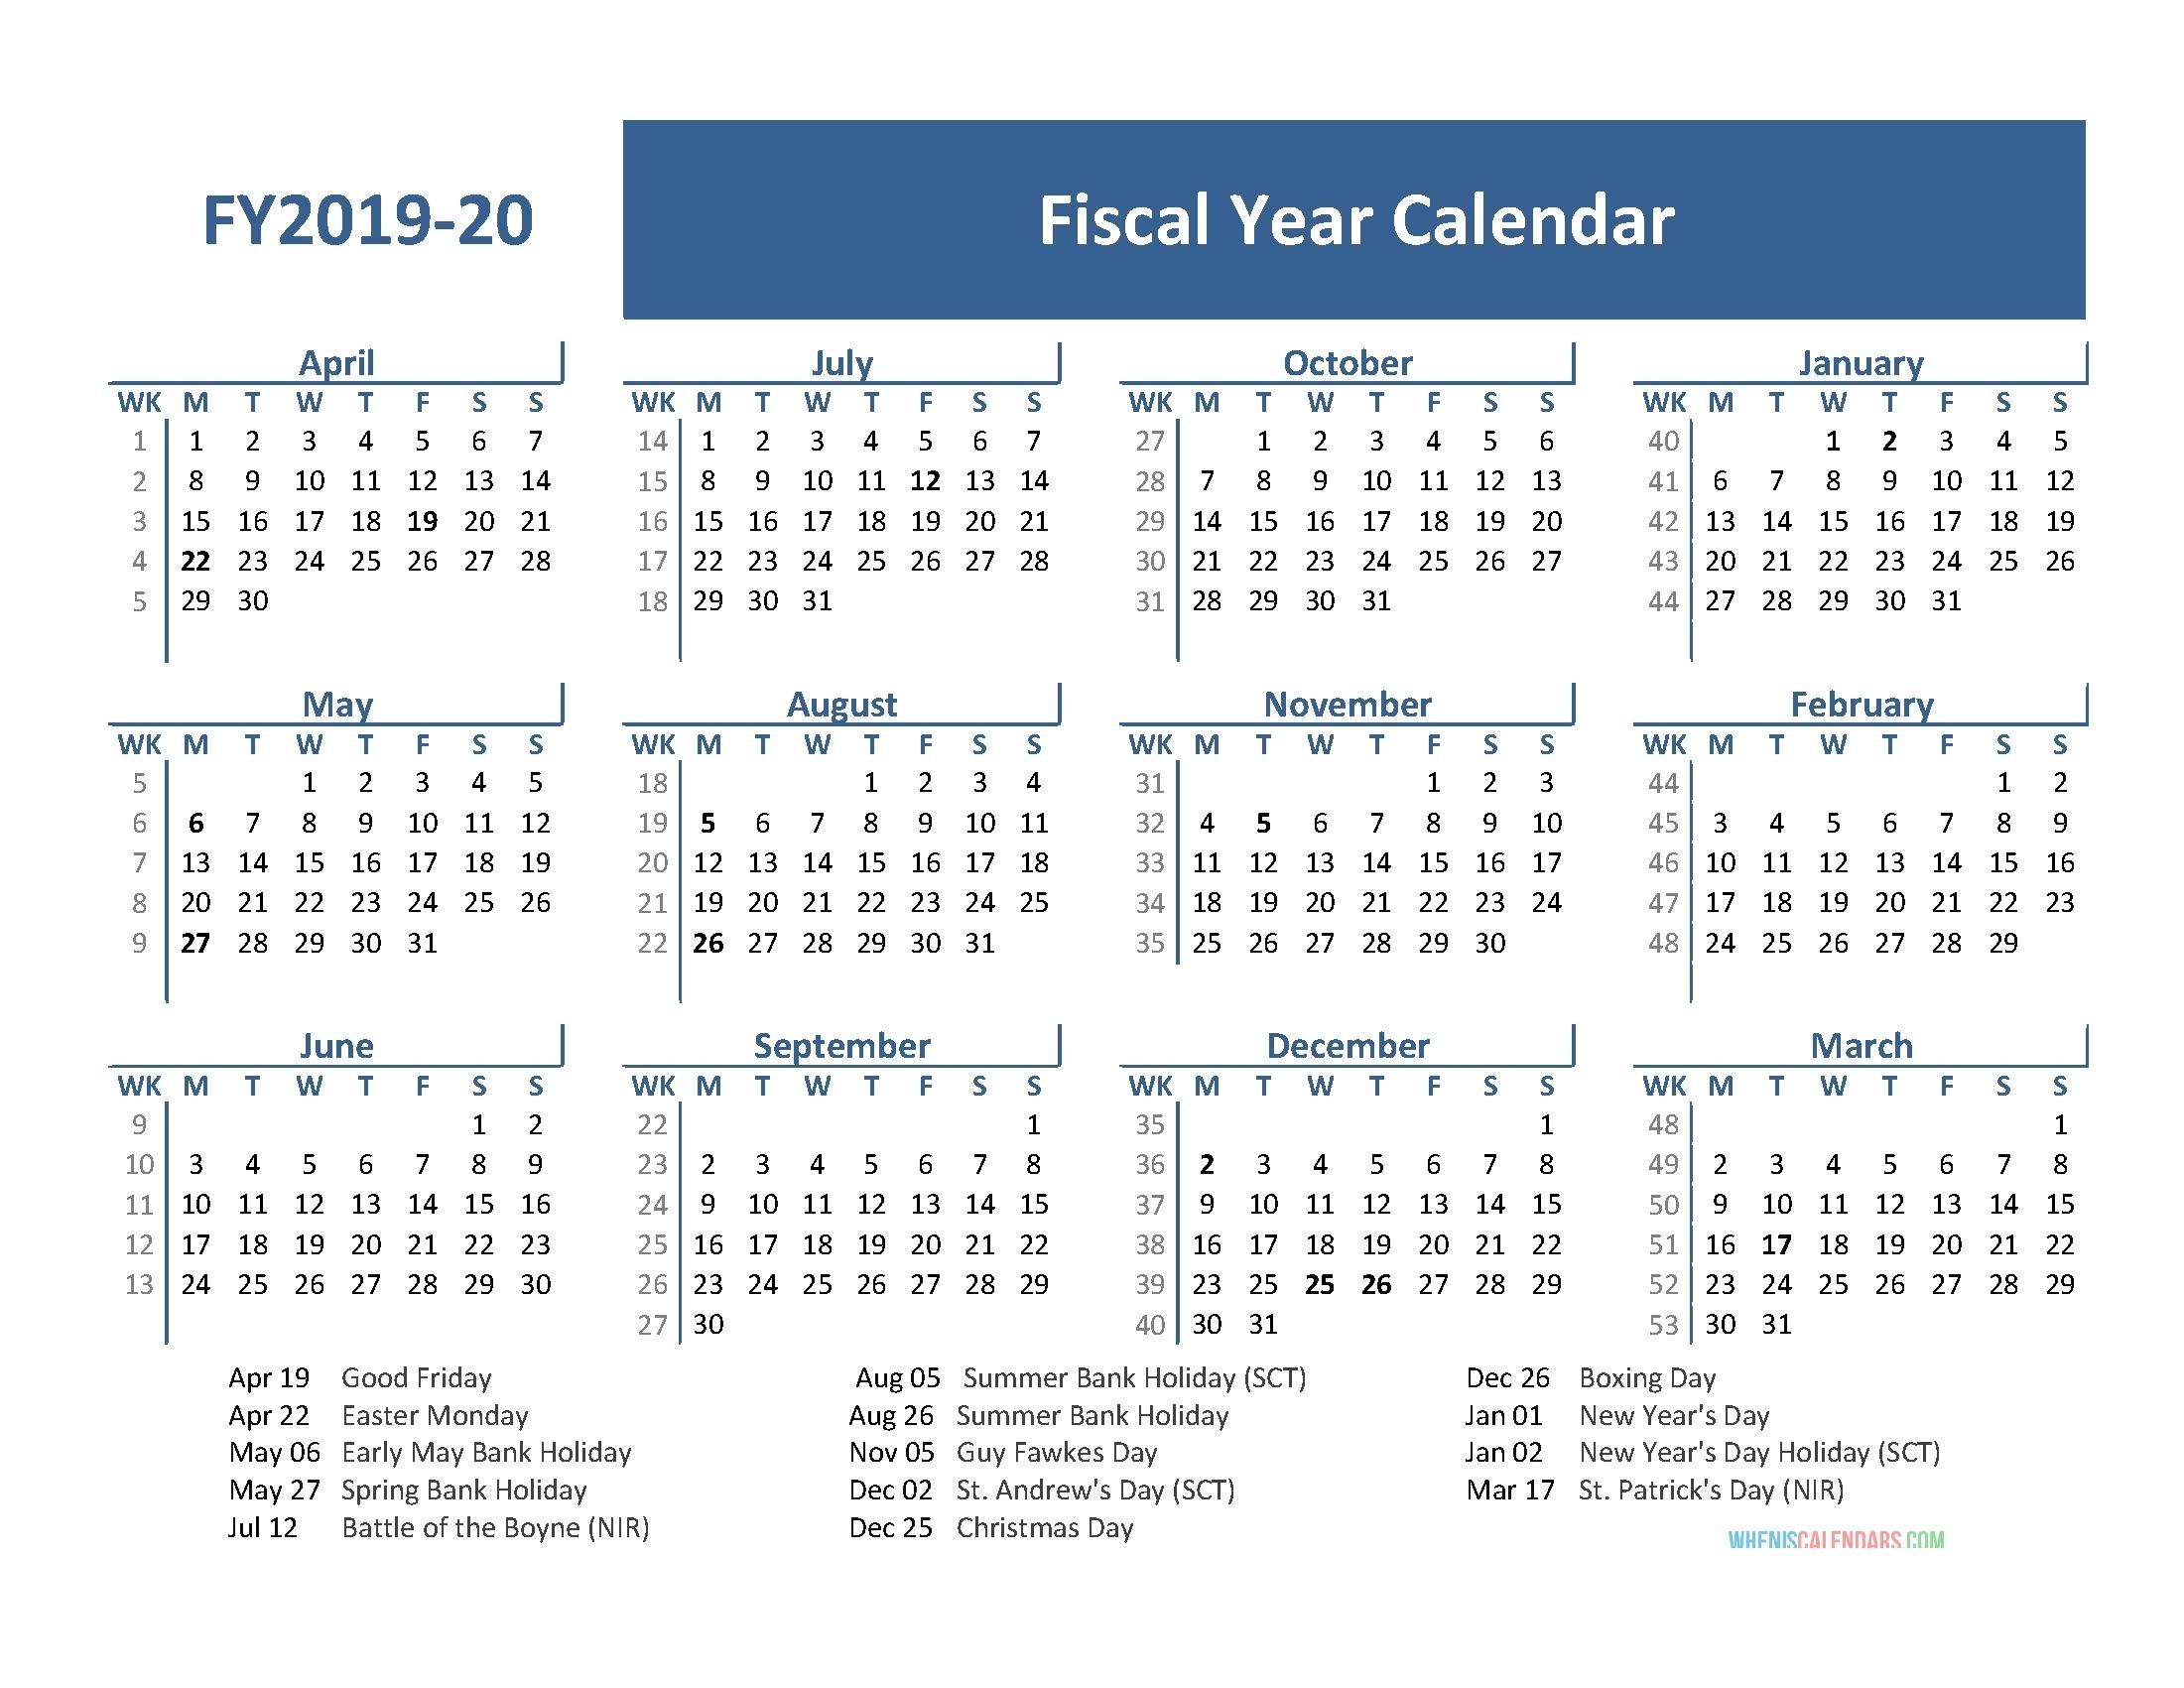 2019-2020 Calendar Financial Week Numbers - Calendar pertaining to Financial Week To Calendar 2019